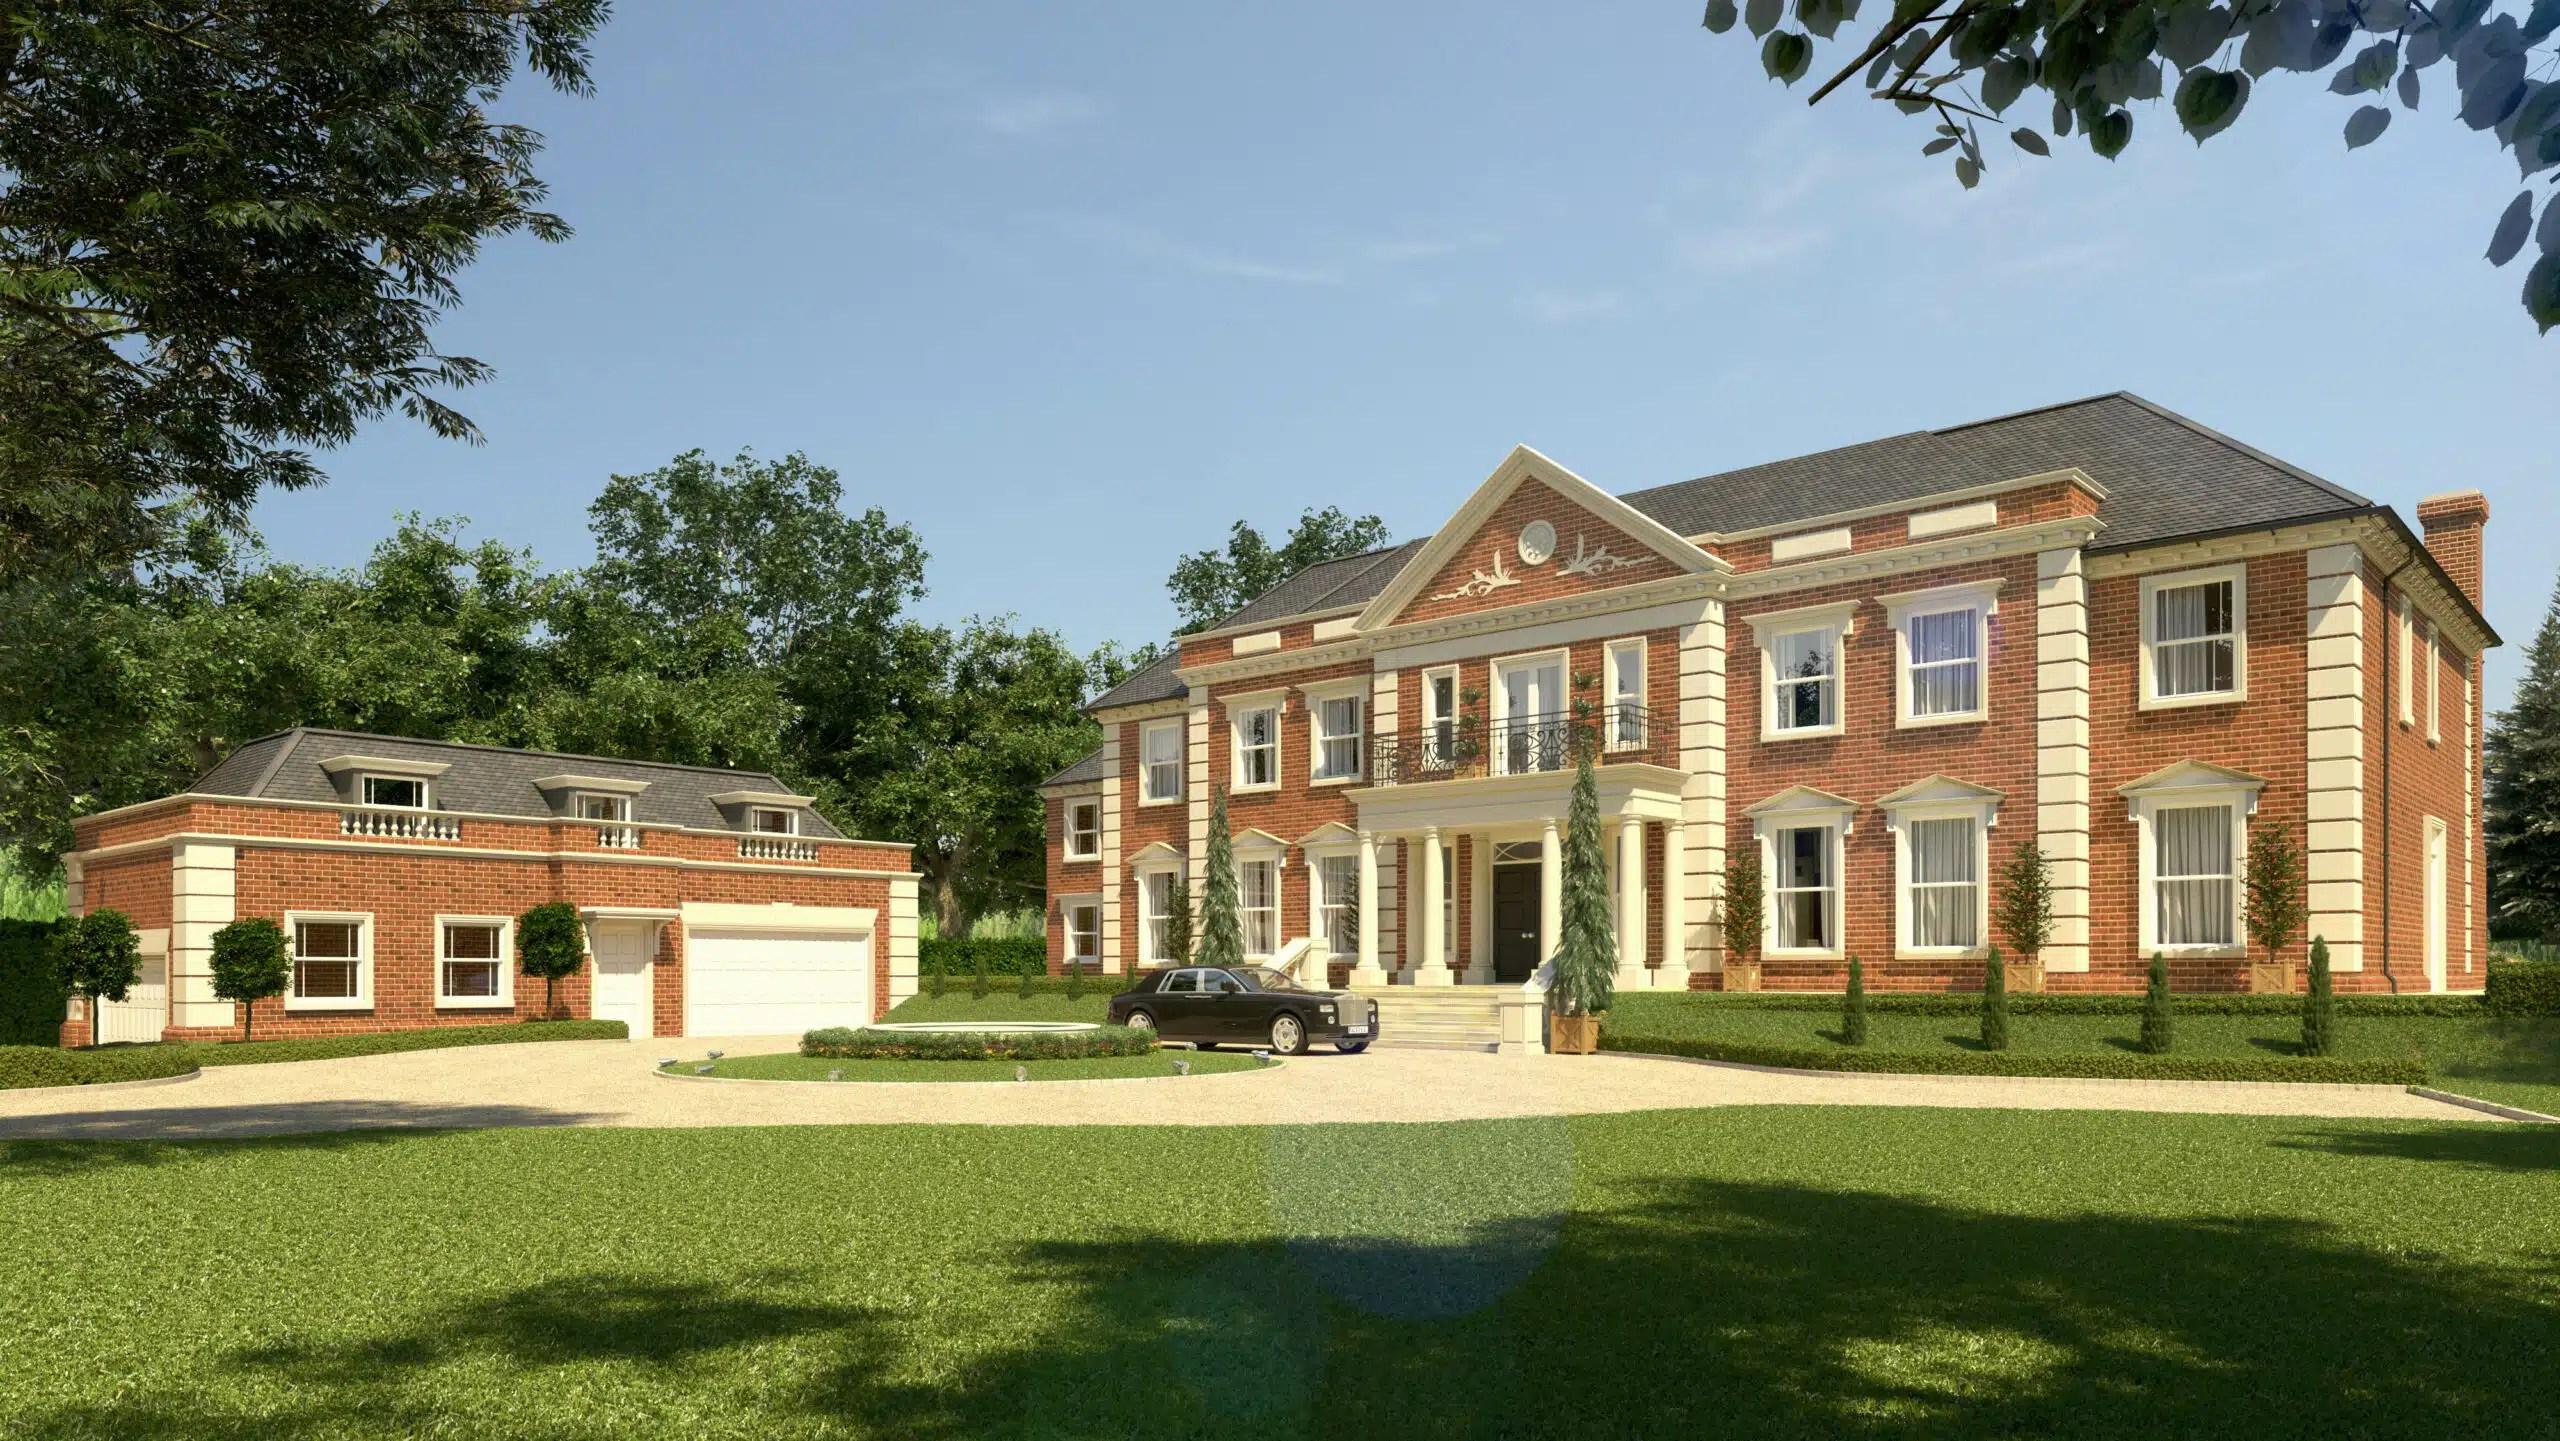 Large Luxury Home Titlarks Hill Ascot Berks